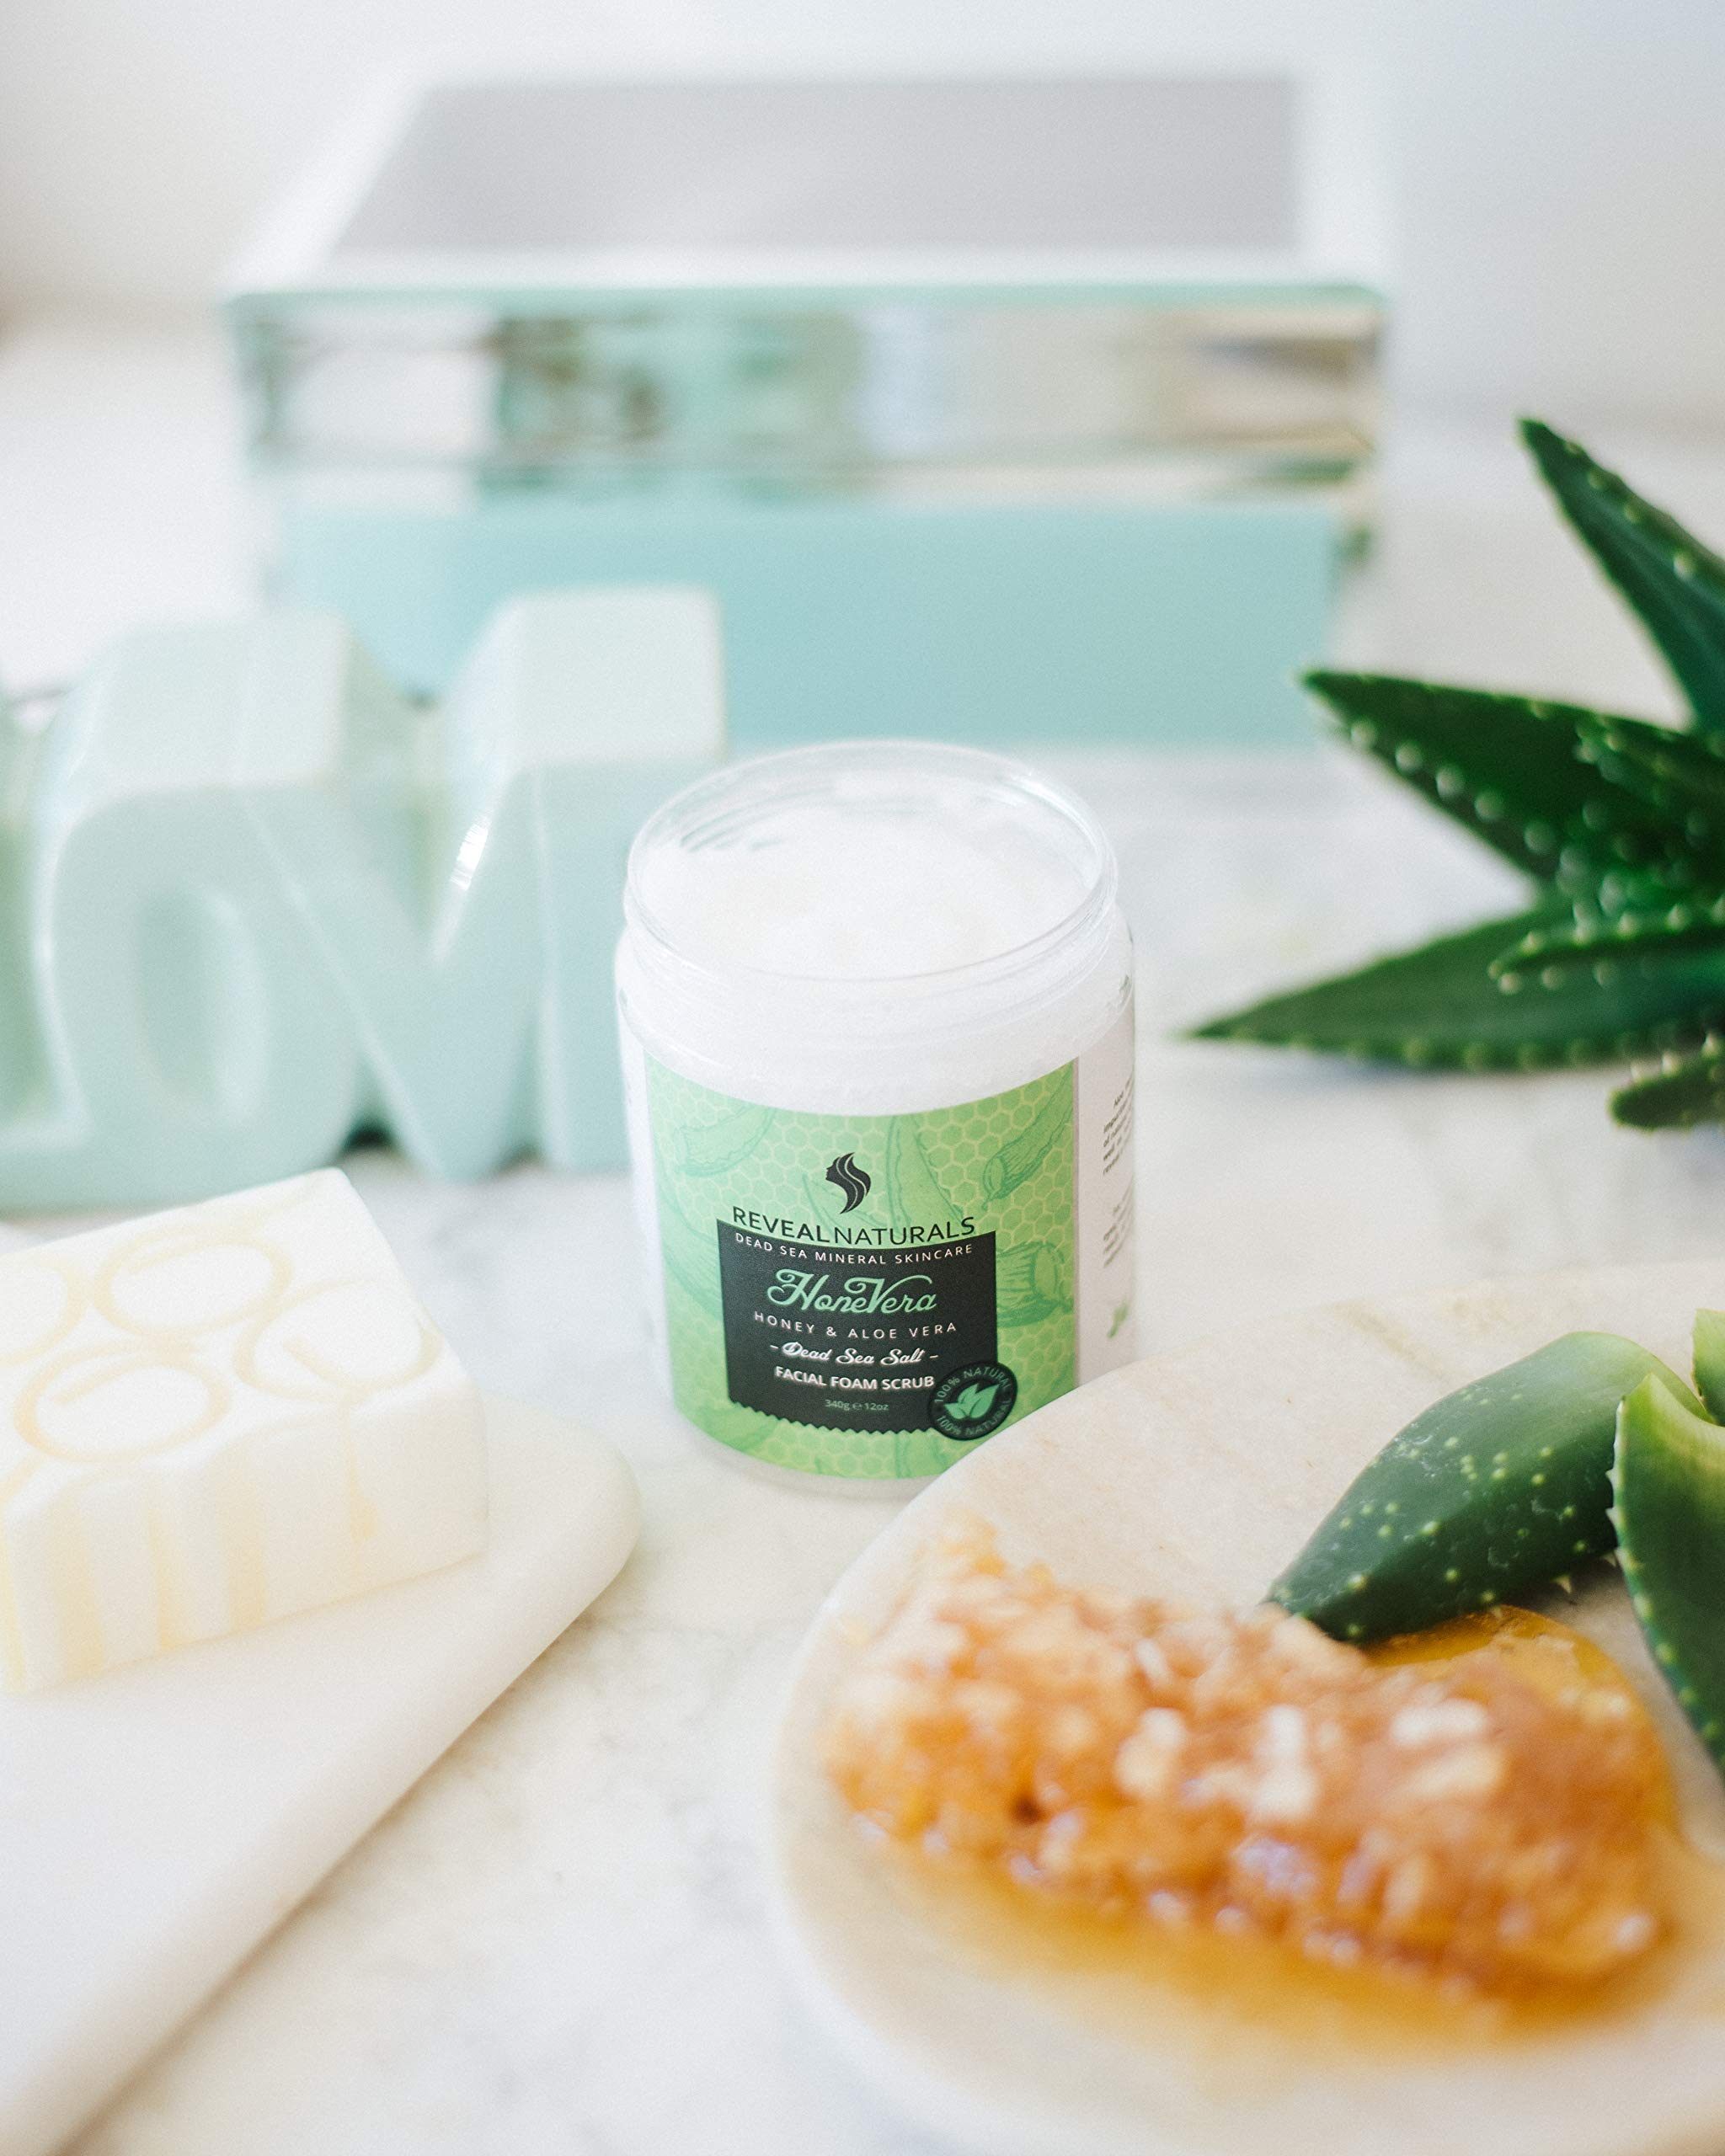 Natural and Organic Aloe Vera Salt Scrub and Body Scrub with Dead Sea Salt, Vitamin E and Honey. Facial Cleanser, Face Wash, Moisturizer, Blackhead Remover, Pore Cleaner and Exfoliating Body Wash